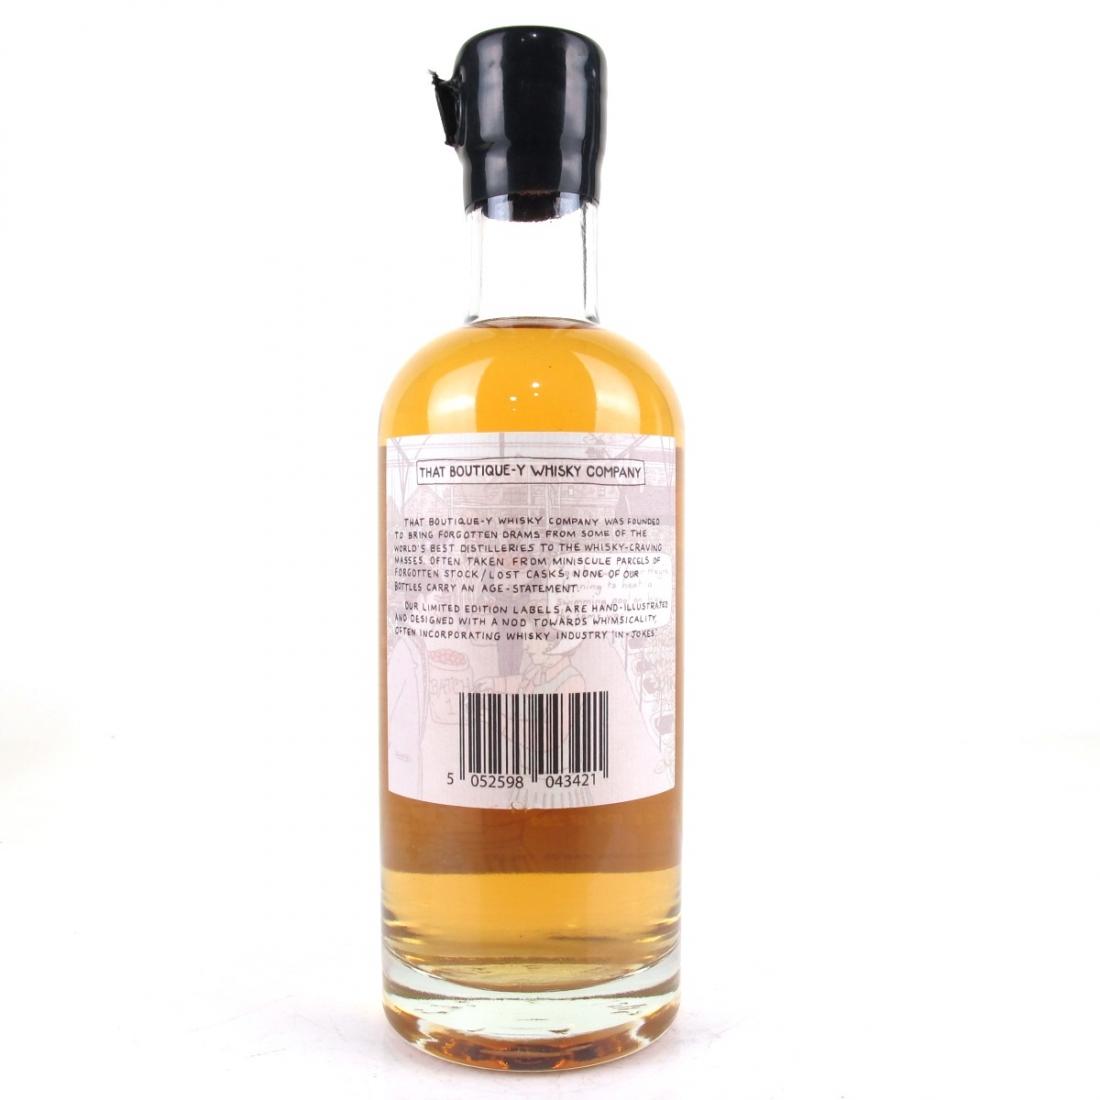 Glen Garioch That Boutique-y Whisky Company Batch #1